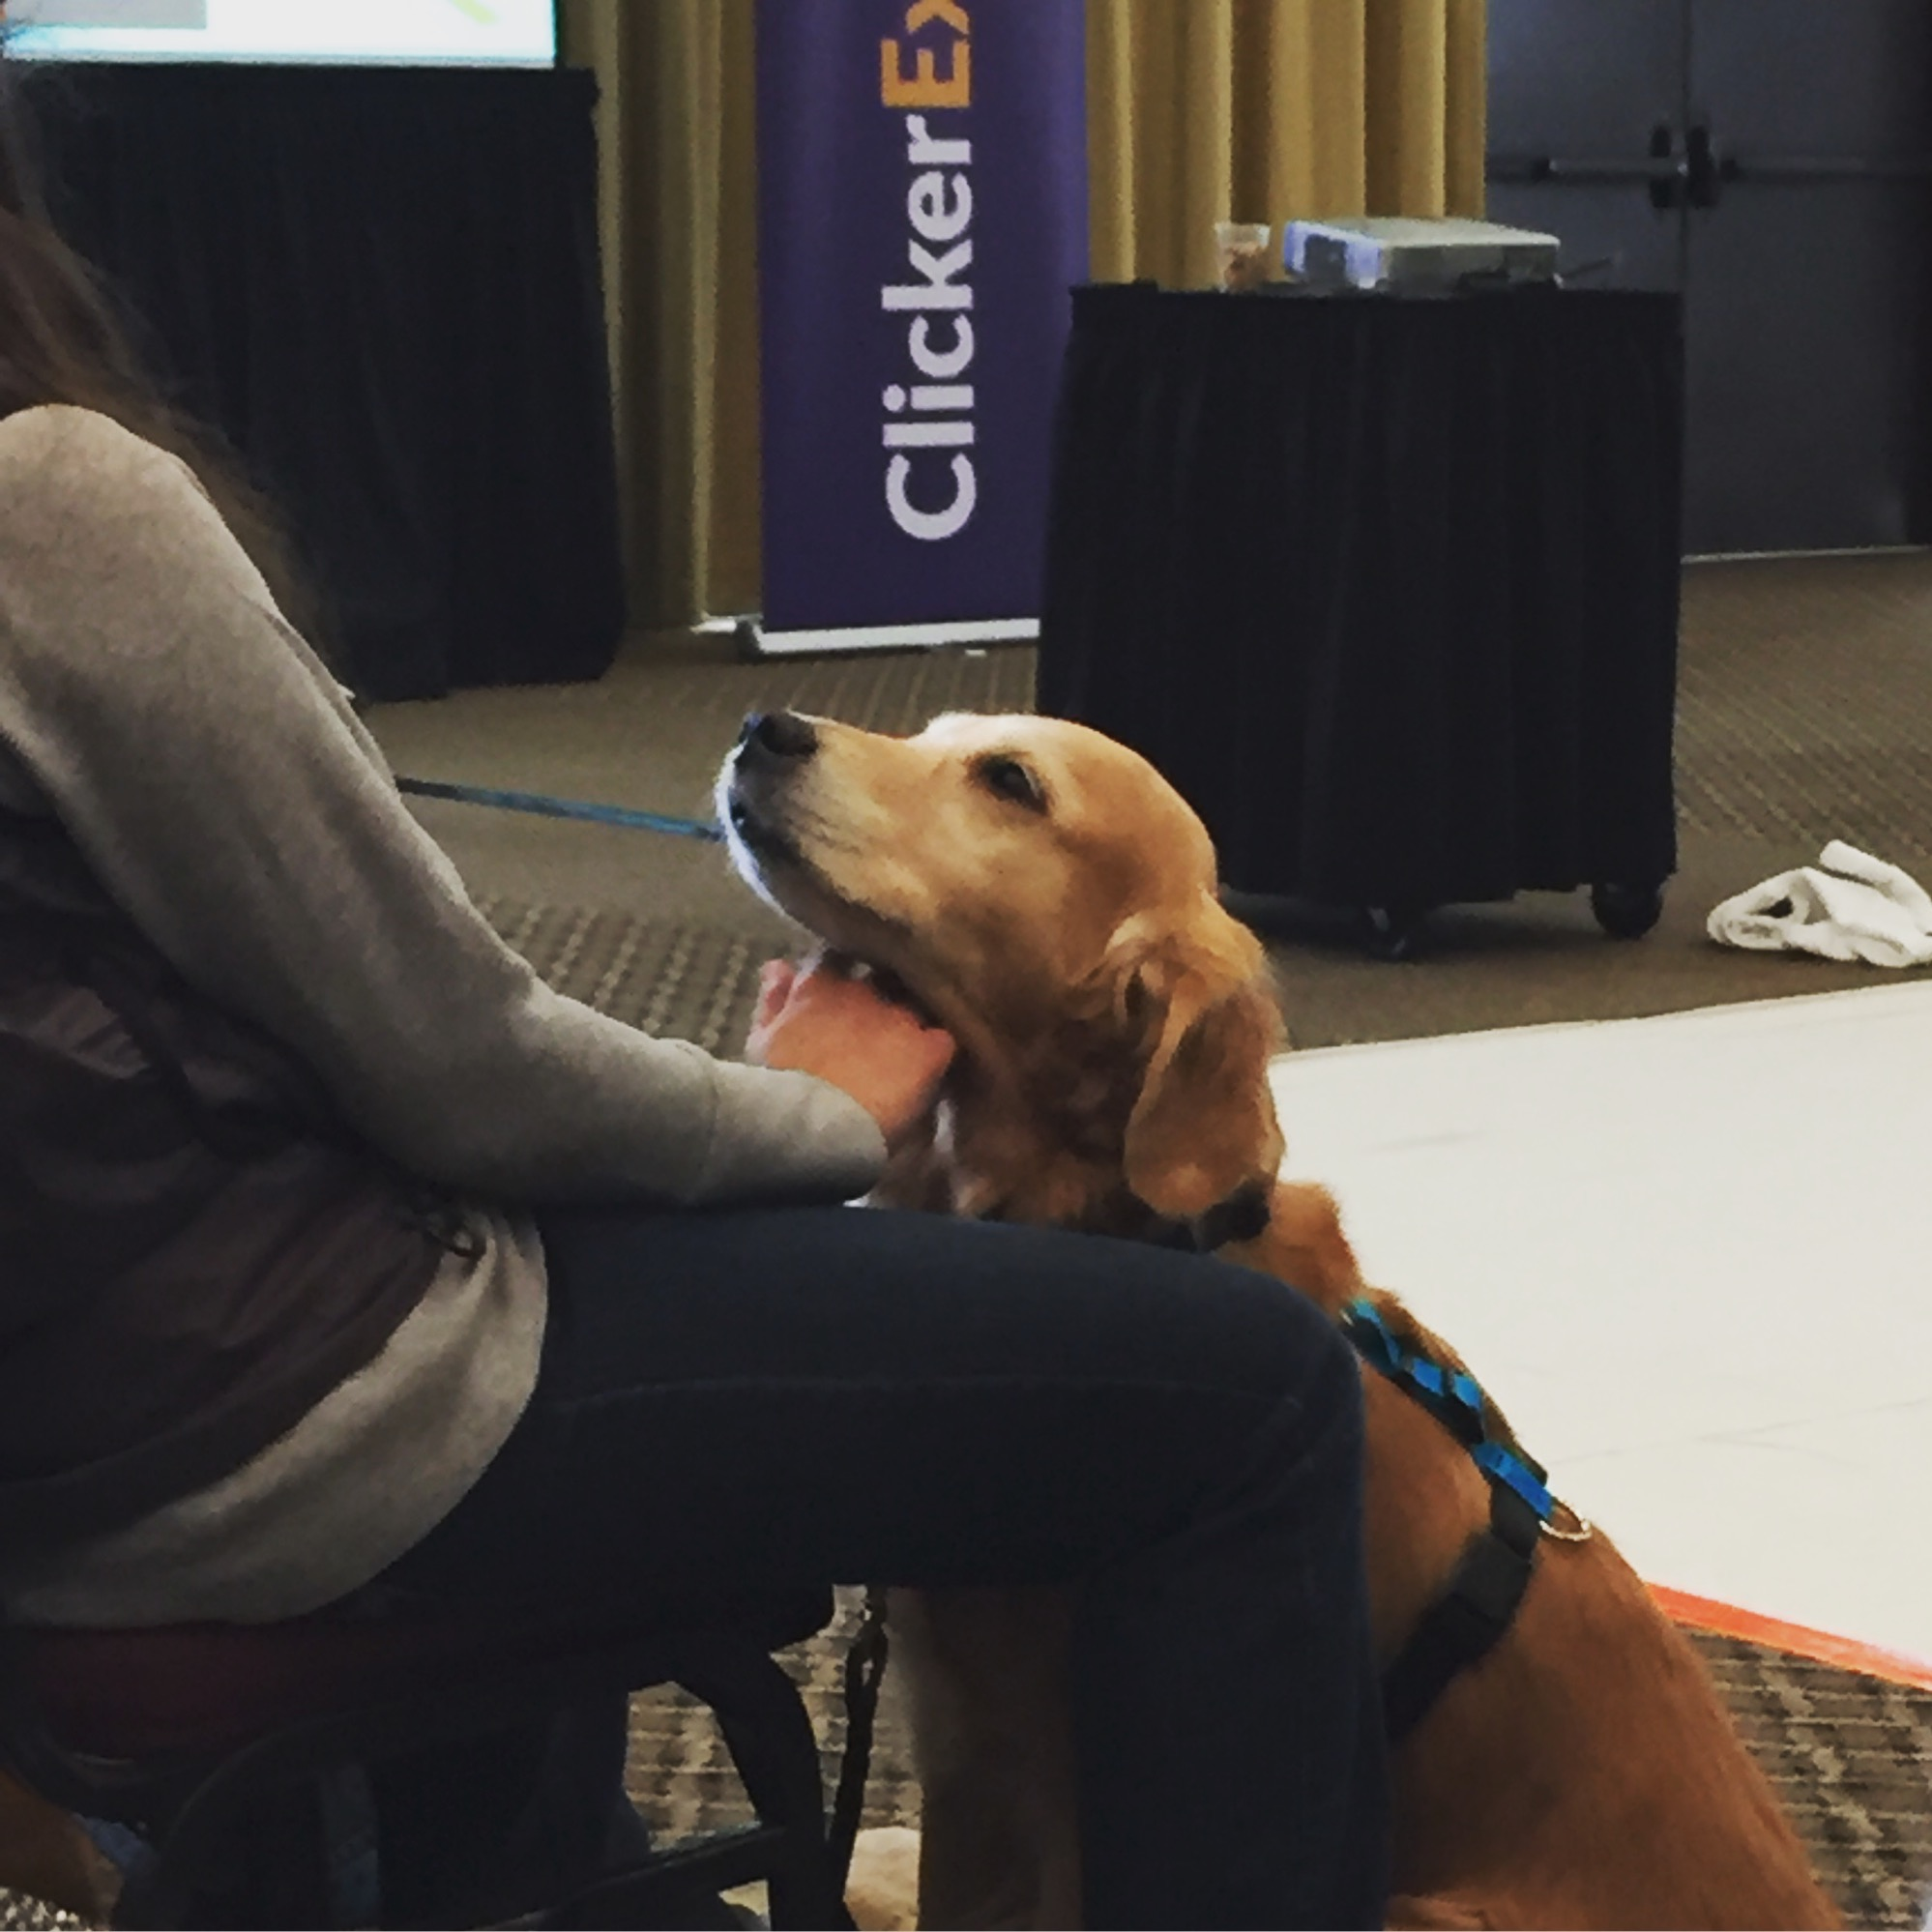 At ClickerExpo in Portland last week